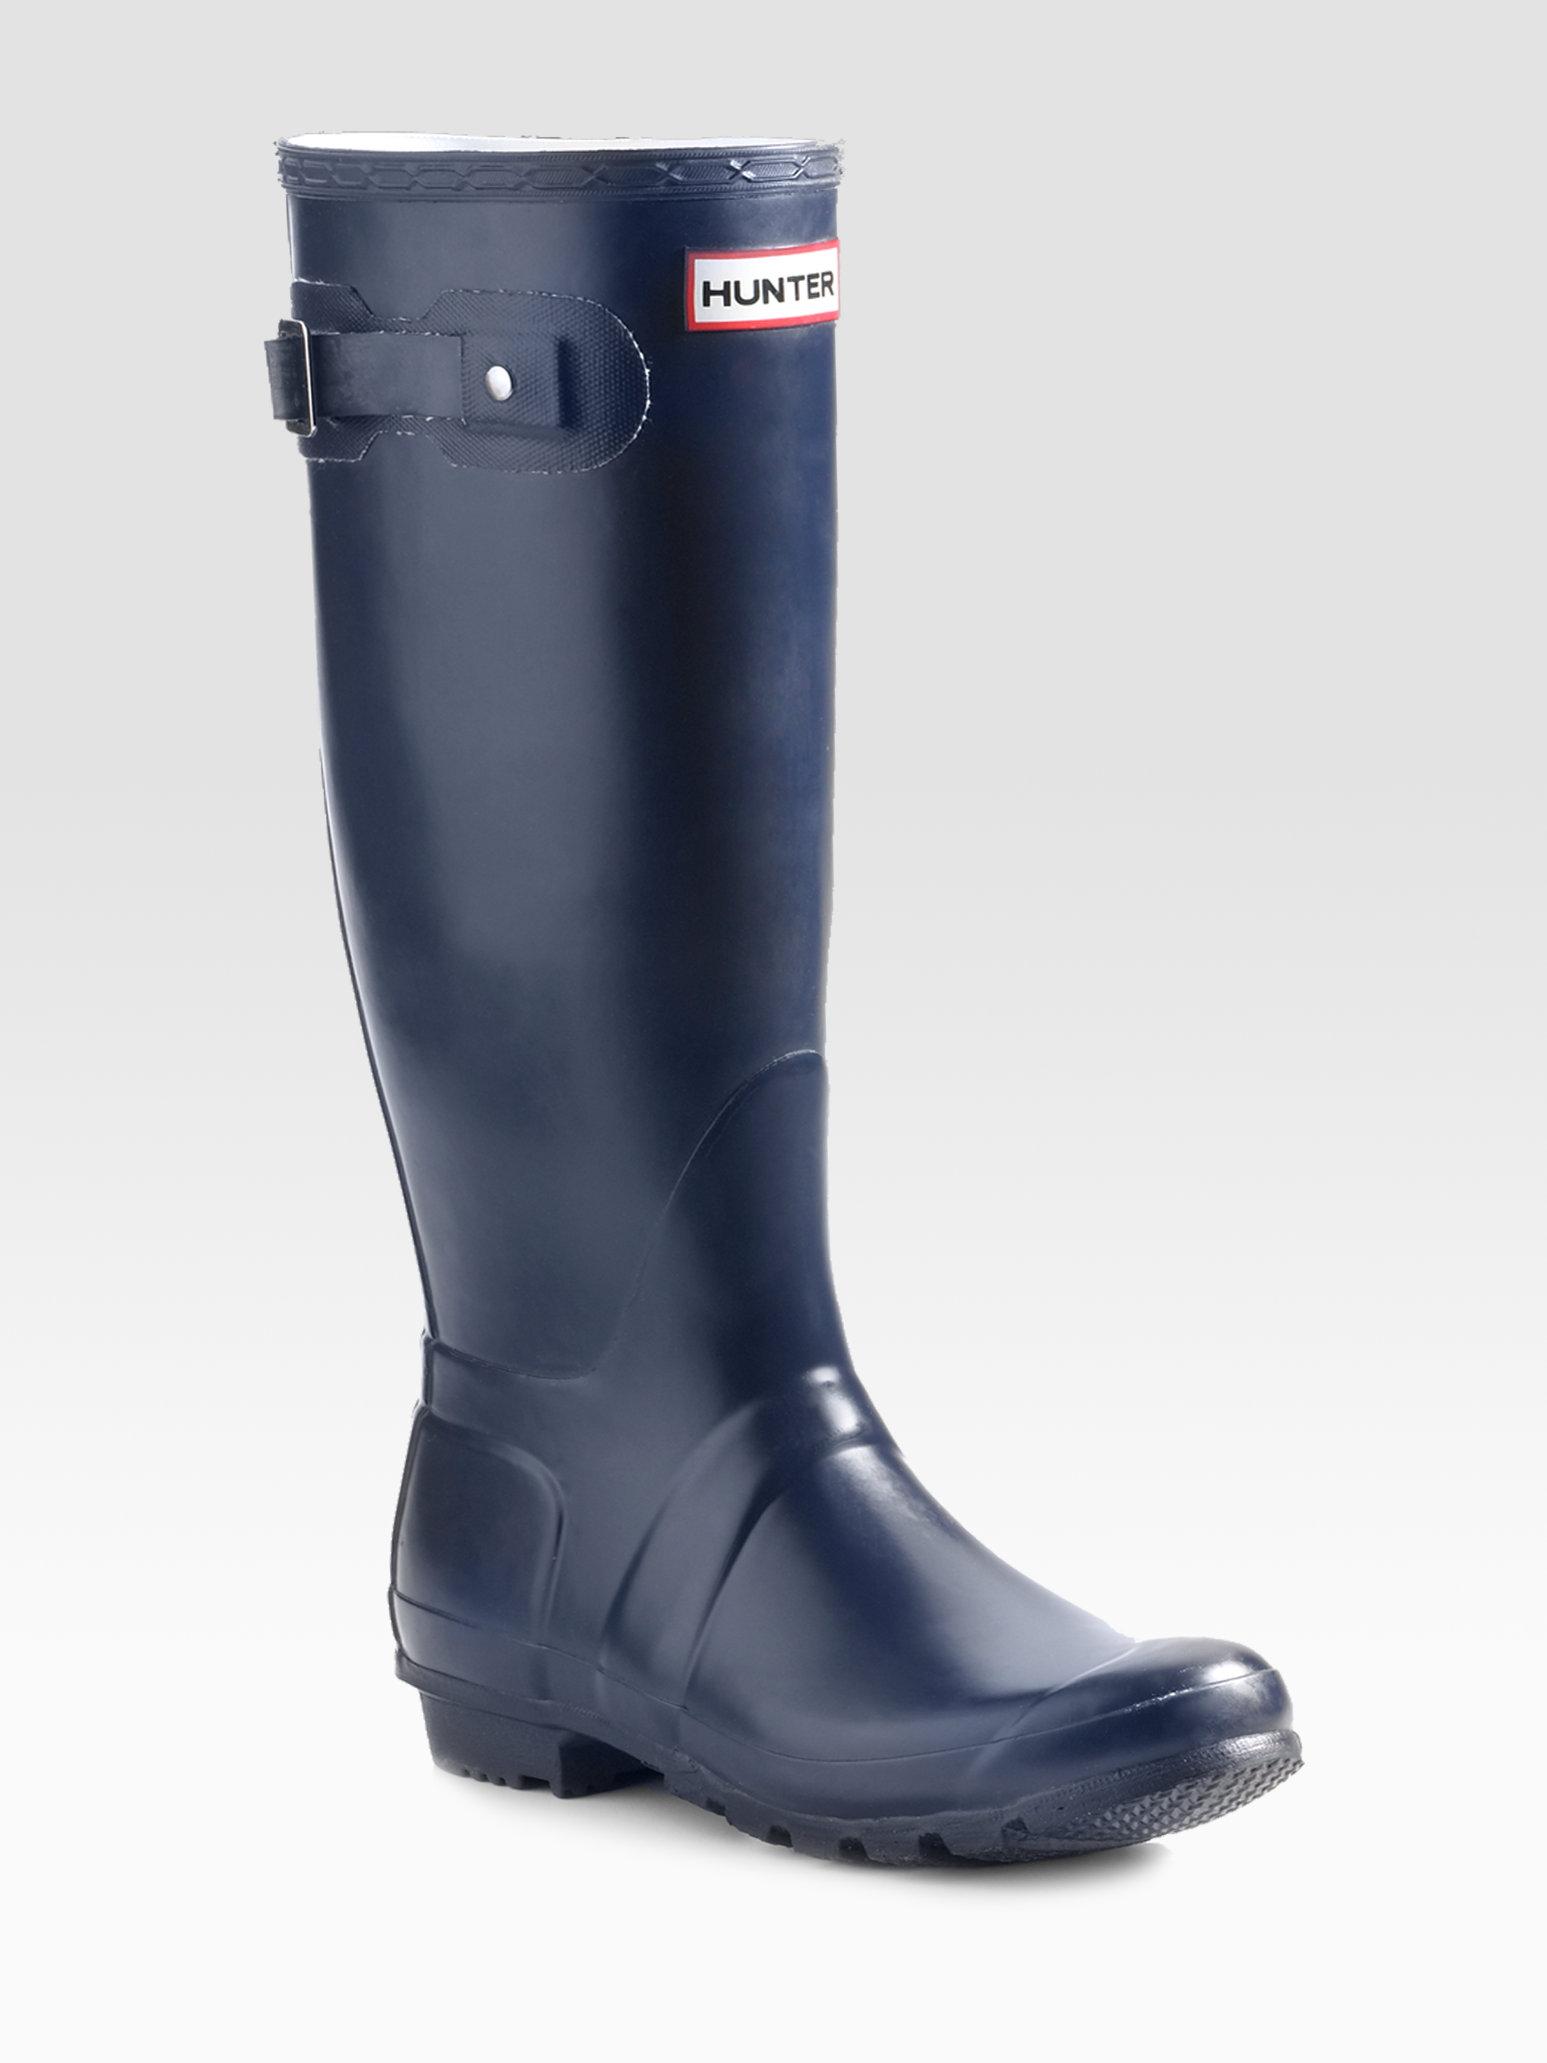 hunter original rain boots in blue navy lyst. Black Bedroom Furniture Sets. Home Design Ideas